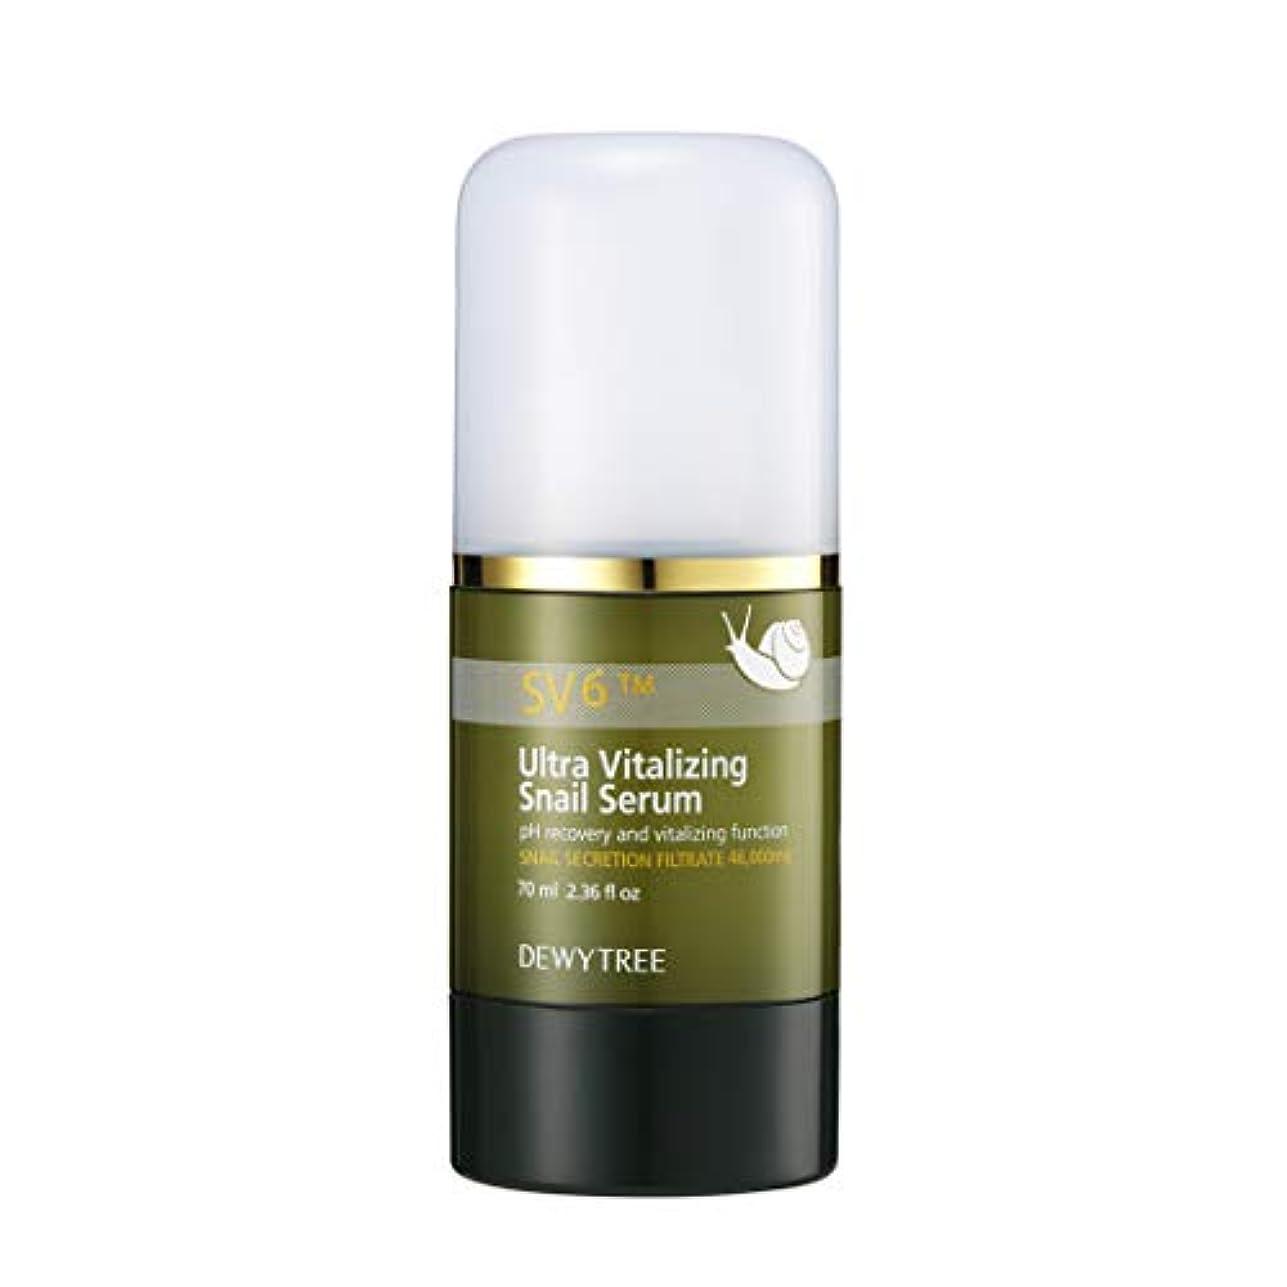 [Dewytree] デュイトゥリー ウルトラバイタルライジングスネイルセラム70ml(Ultra Vitalizing Snail Serum 70ml)【並行輸入品】